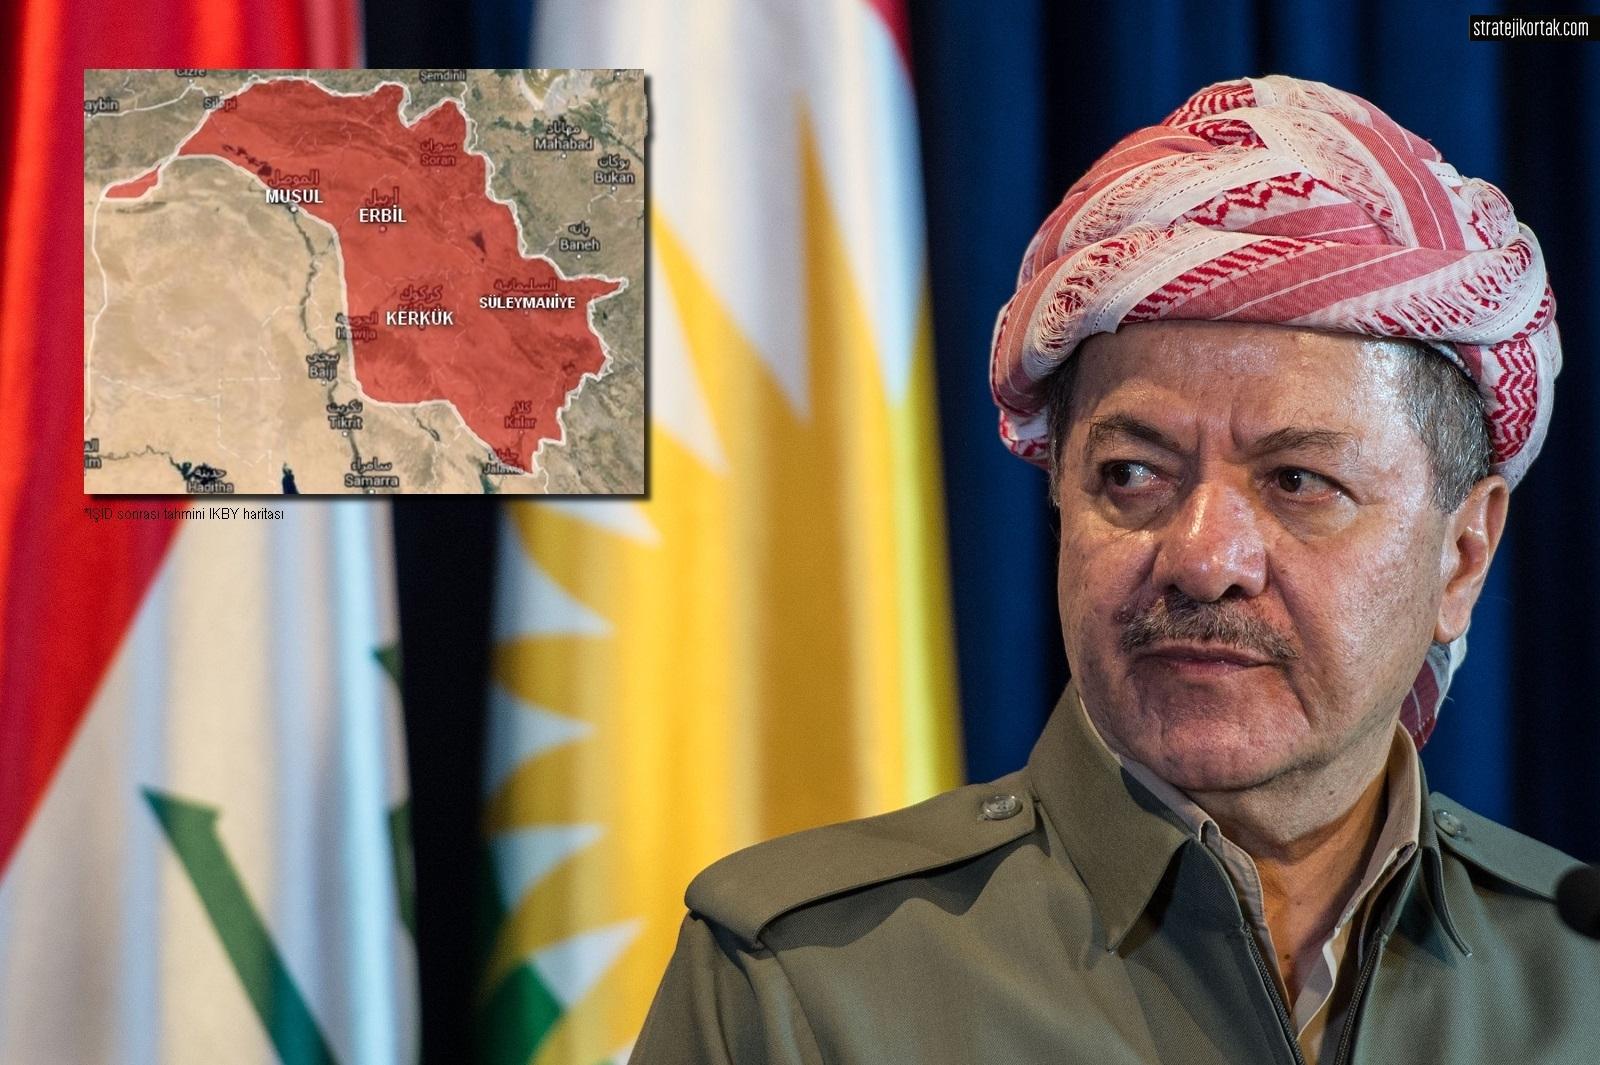 bagimsiz-kurdistan-referandumu